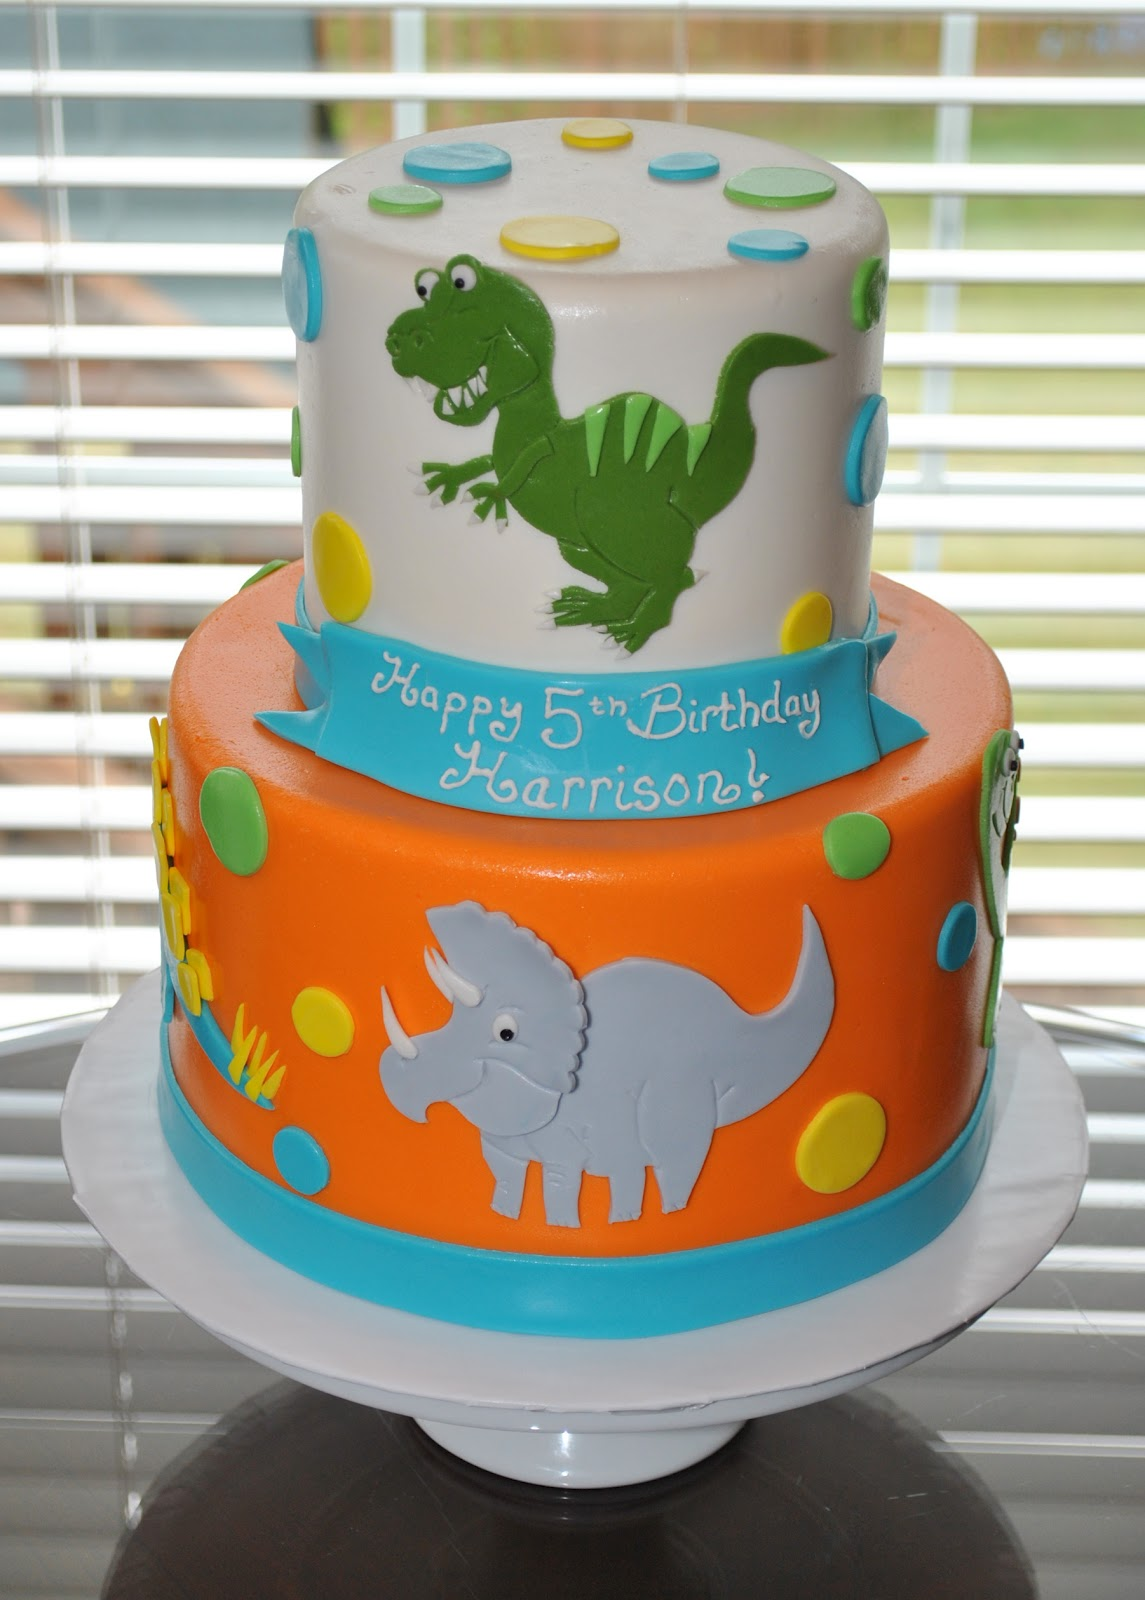 Hope's Sweet Cakes: June 2012